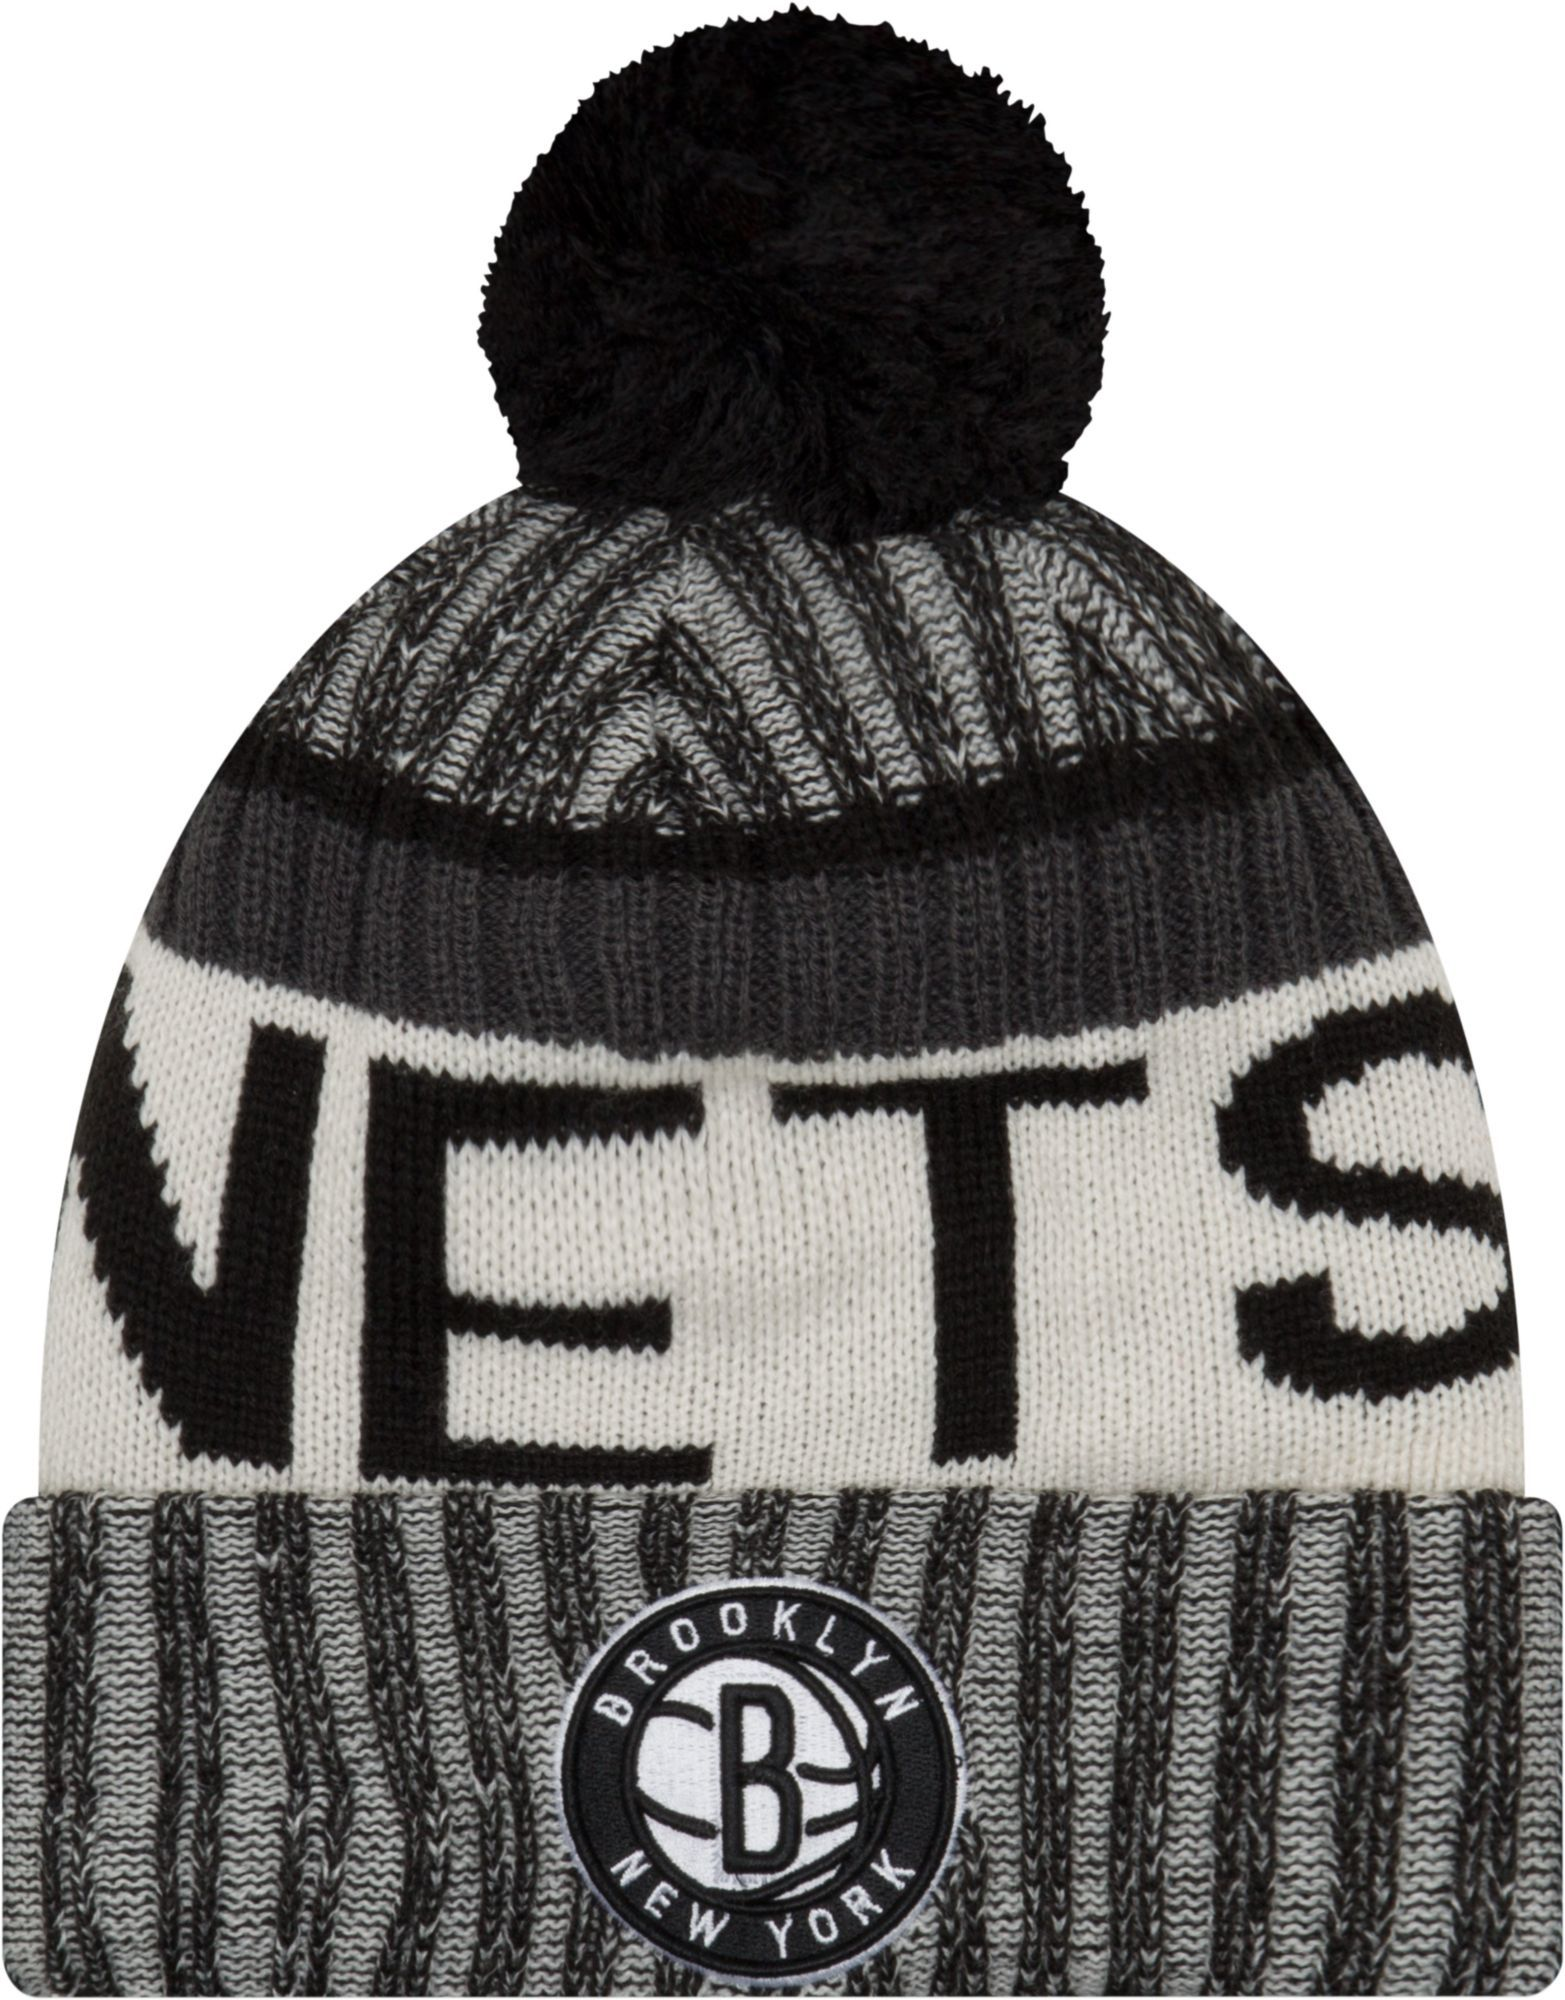 c2b868f43ae New Era Youth Brooklyn Nets Knit Hat